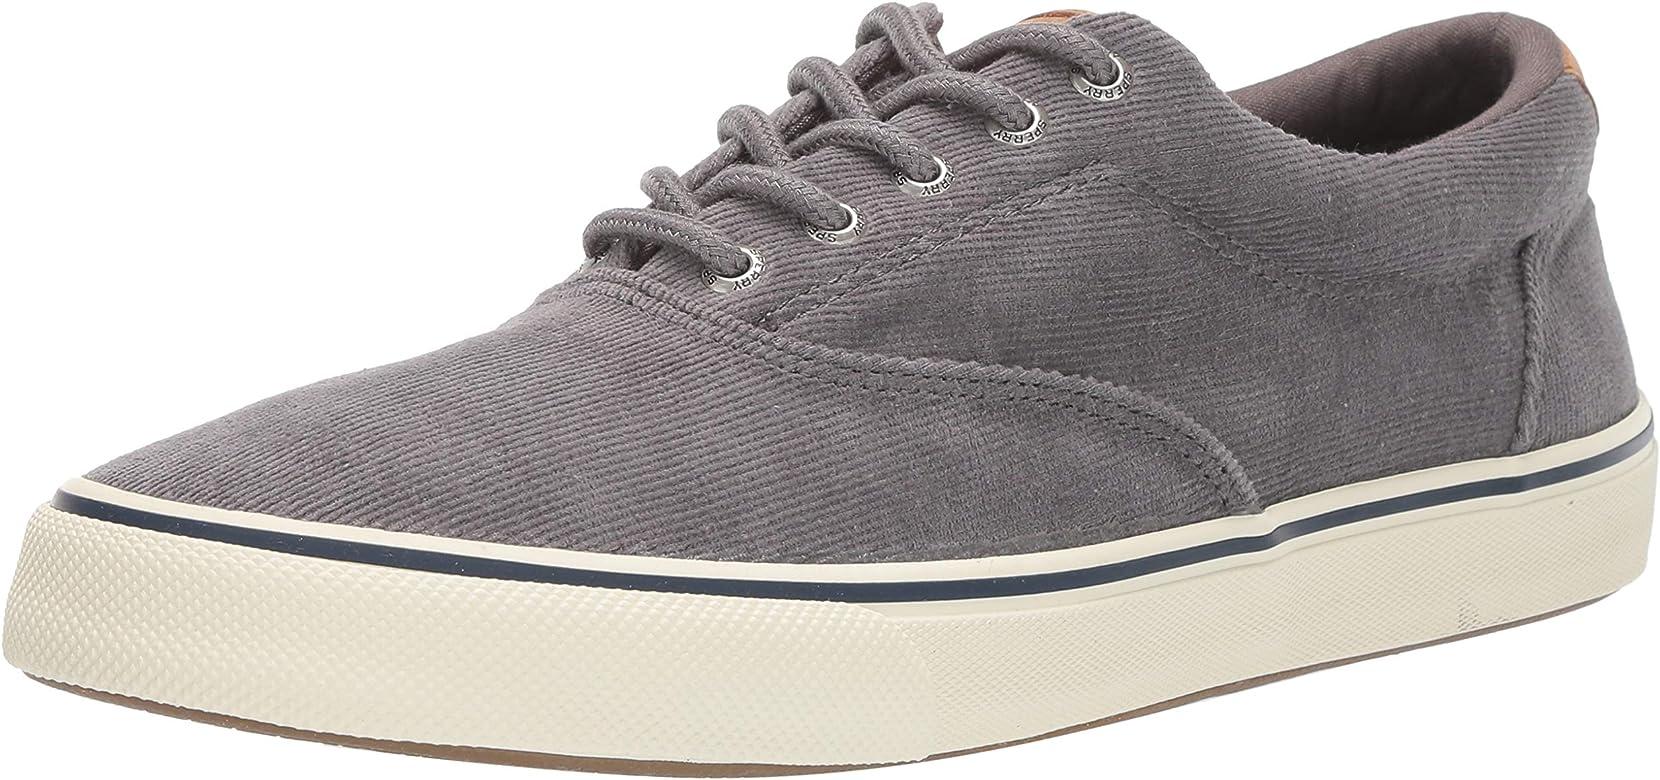 Striper II CVO Corduroy Shoes